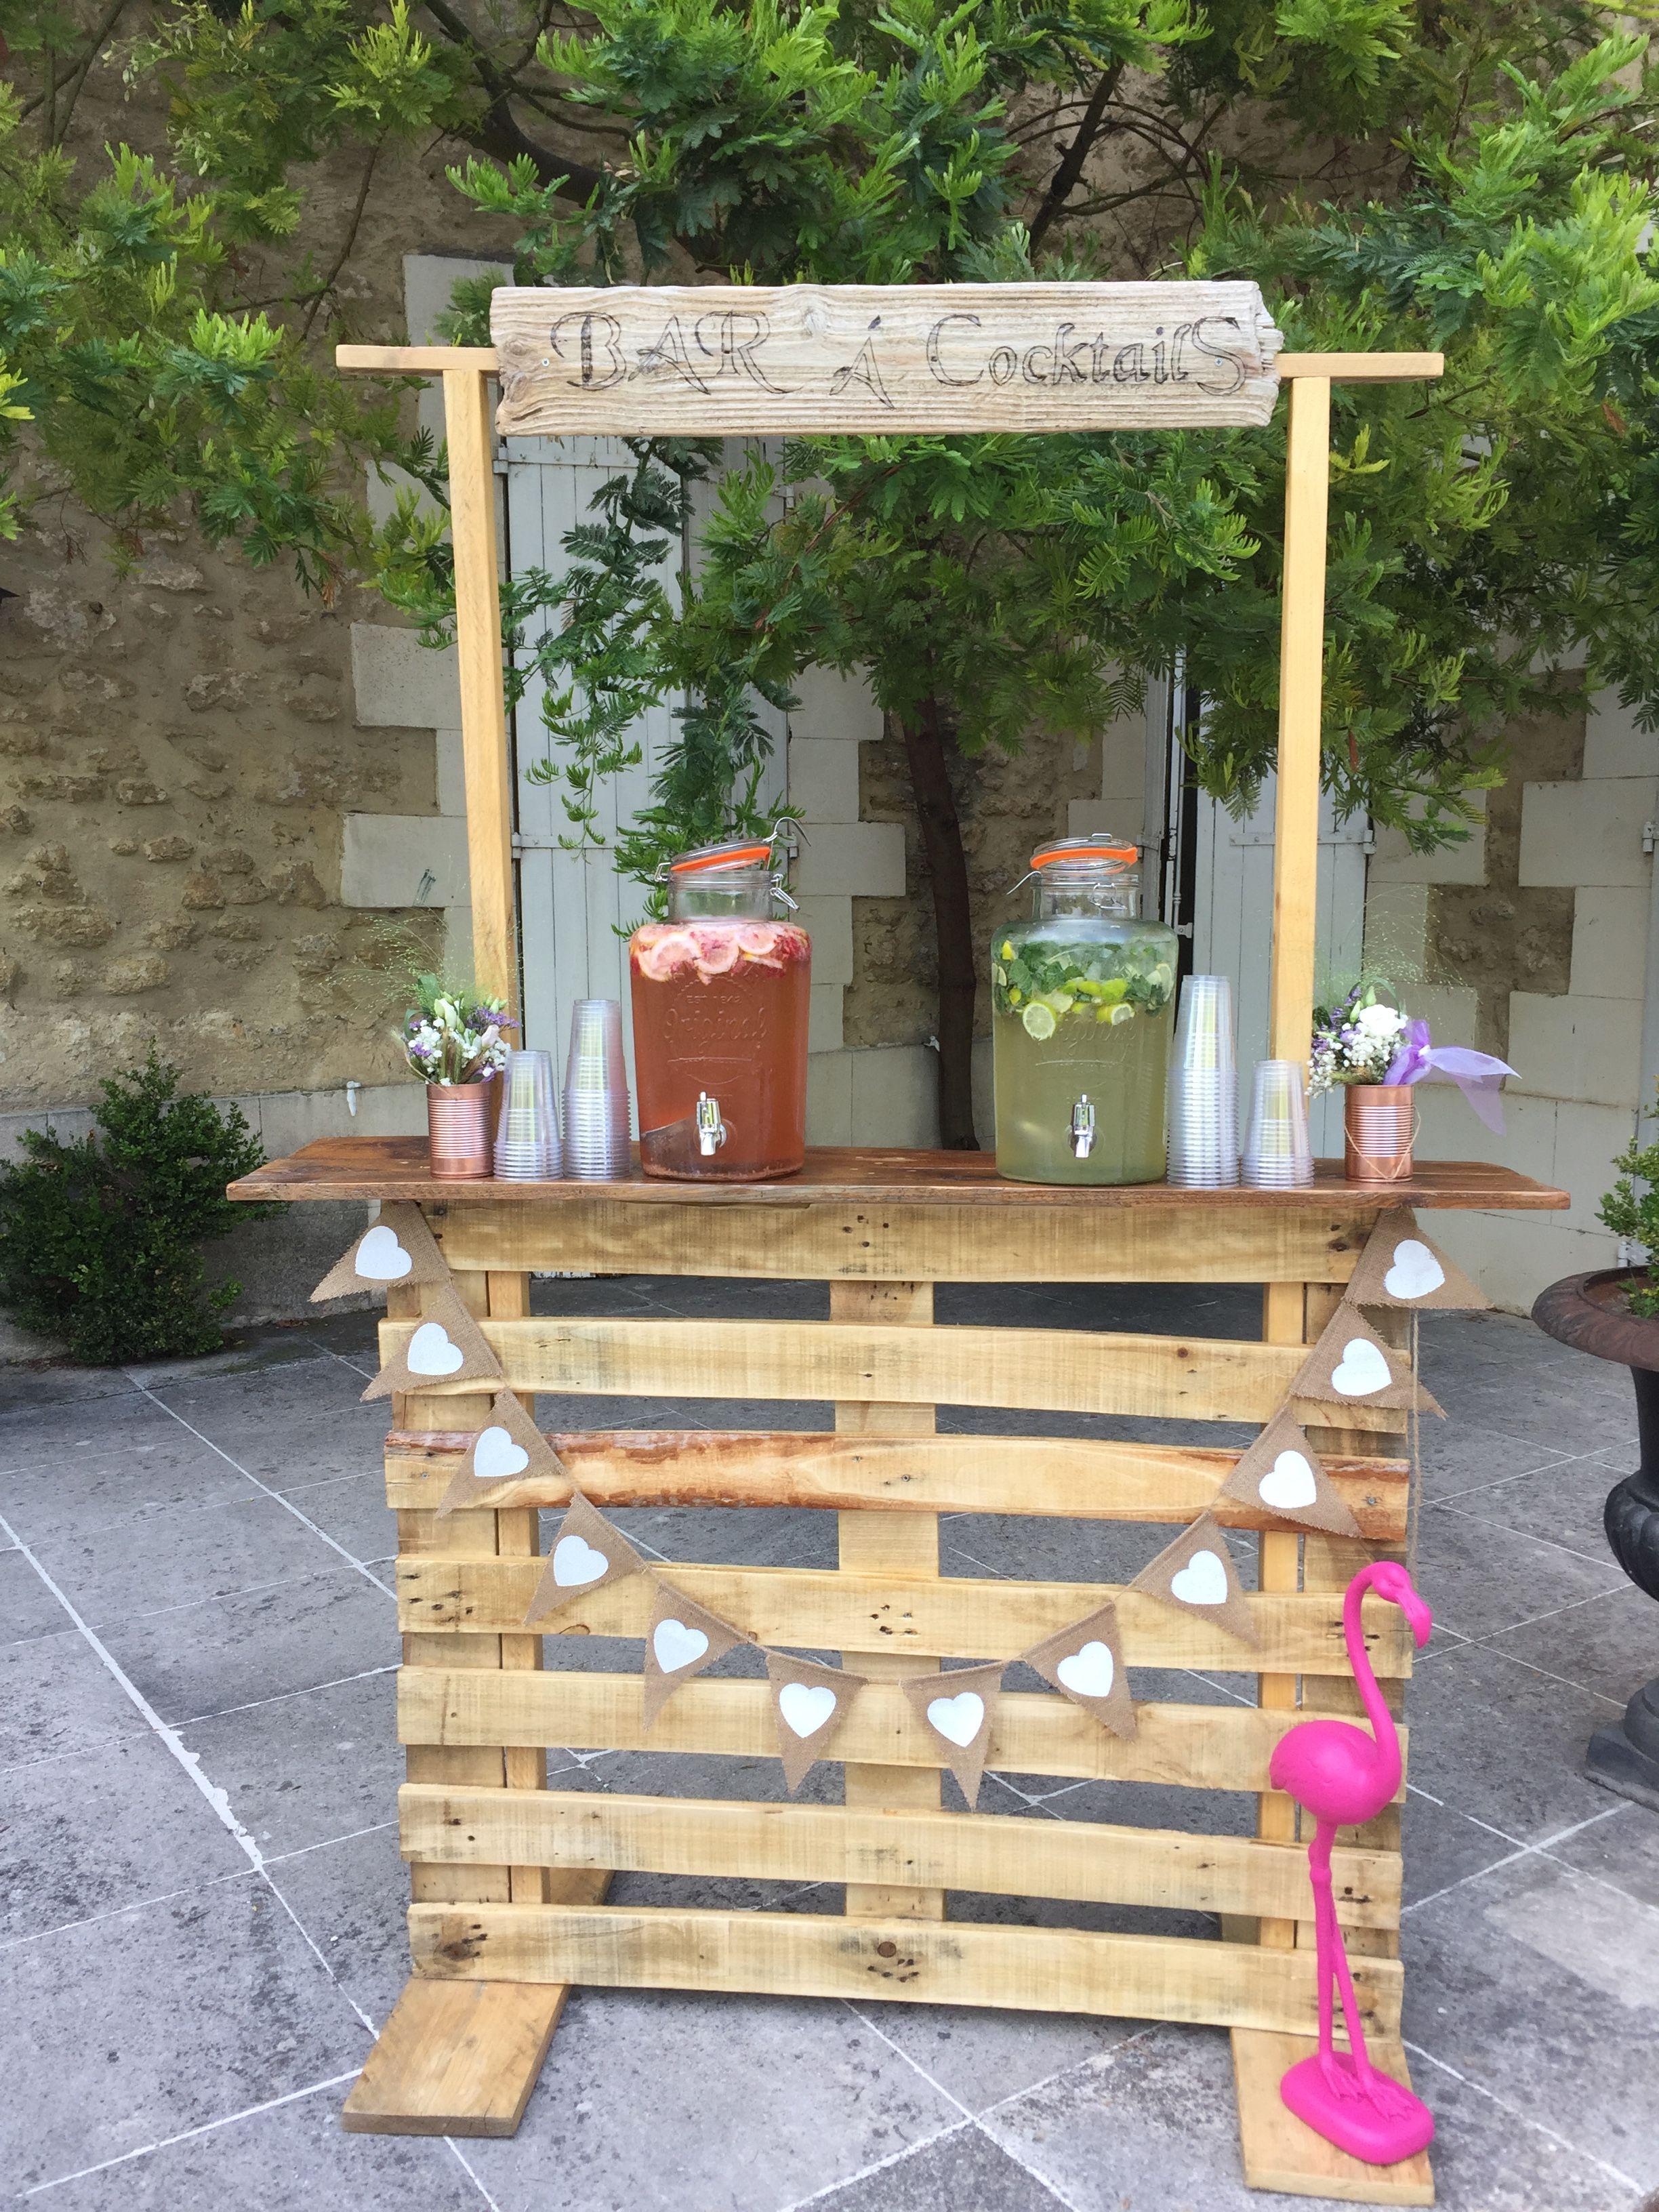 Photo of Bar de jugos